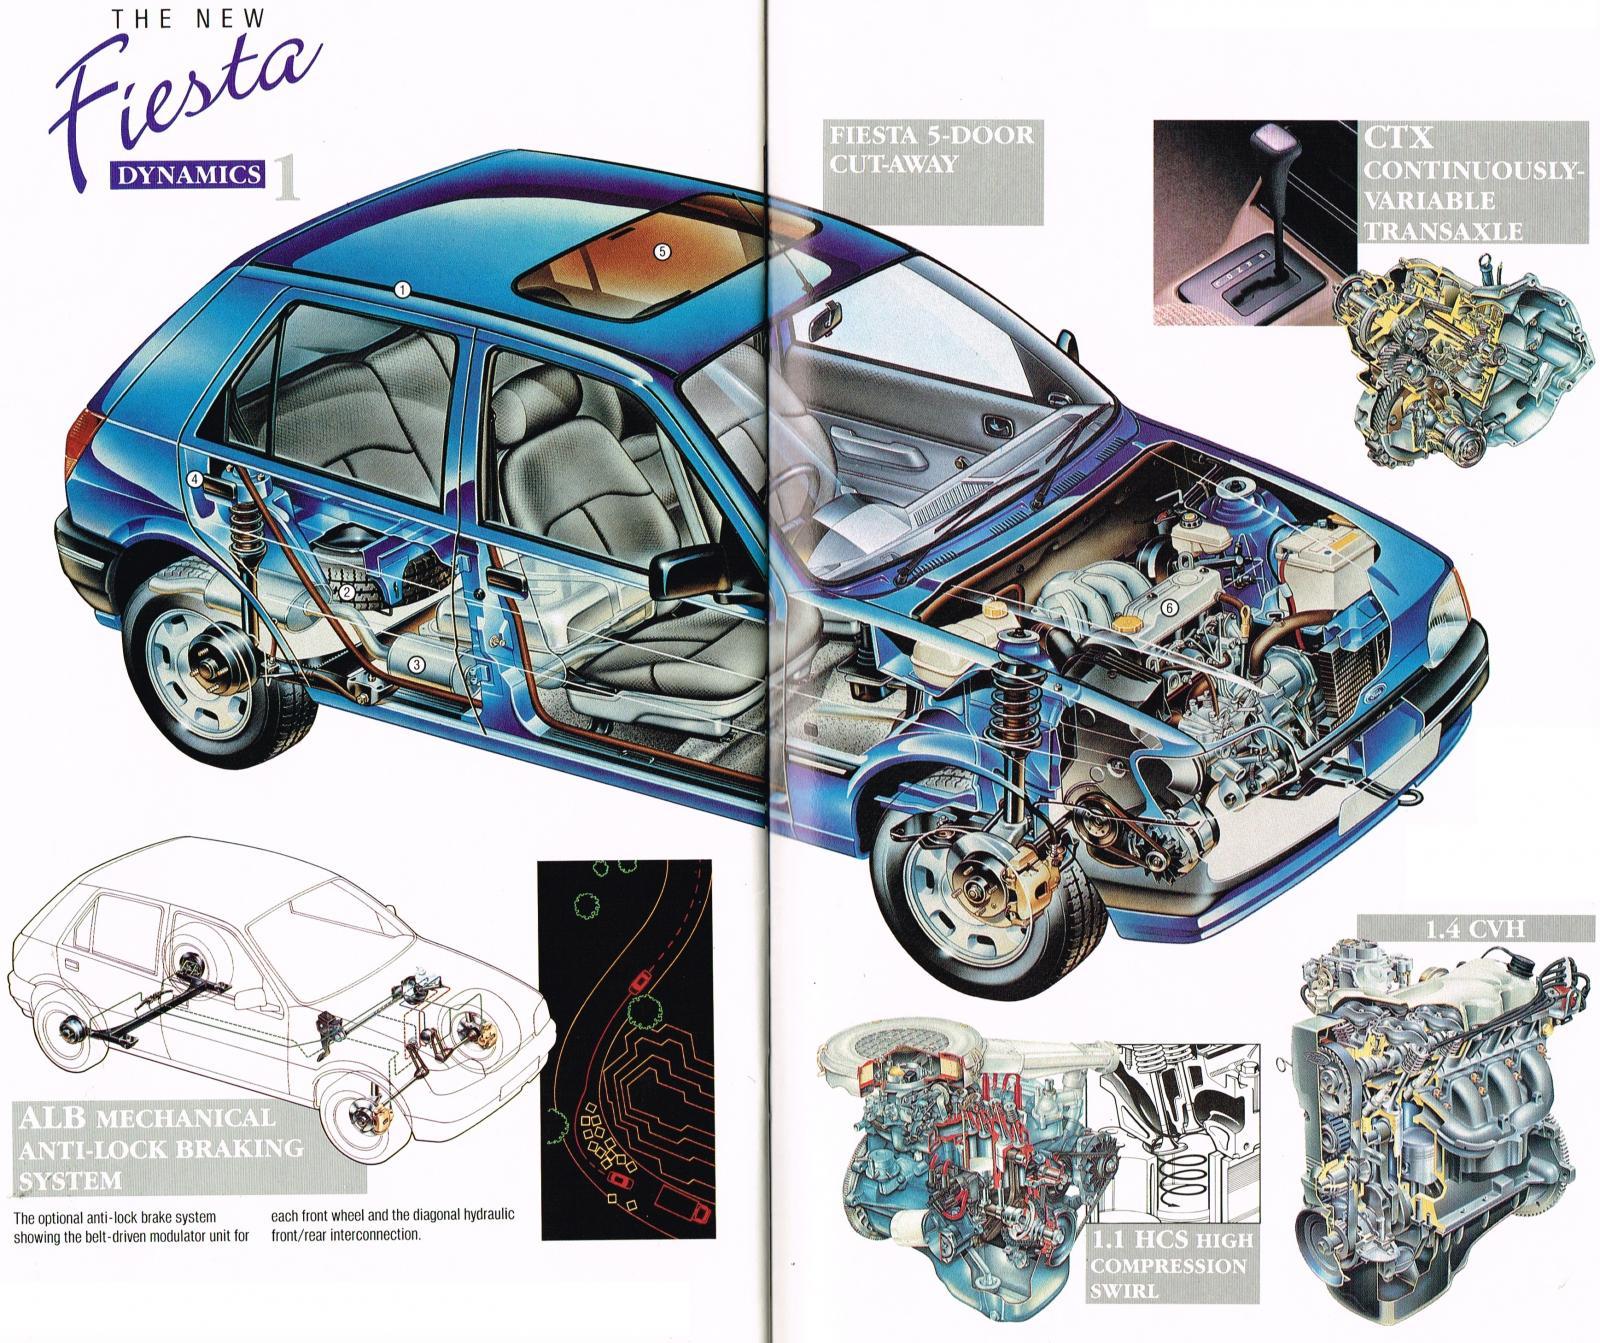 Ford Fiesta Mk3 launch brochure 1989 34-35.jpg